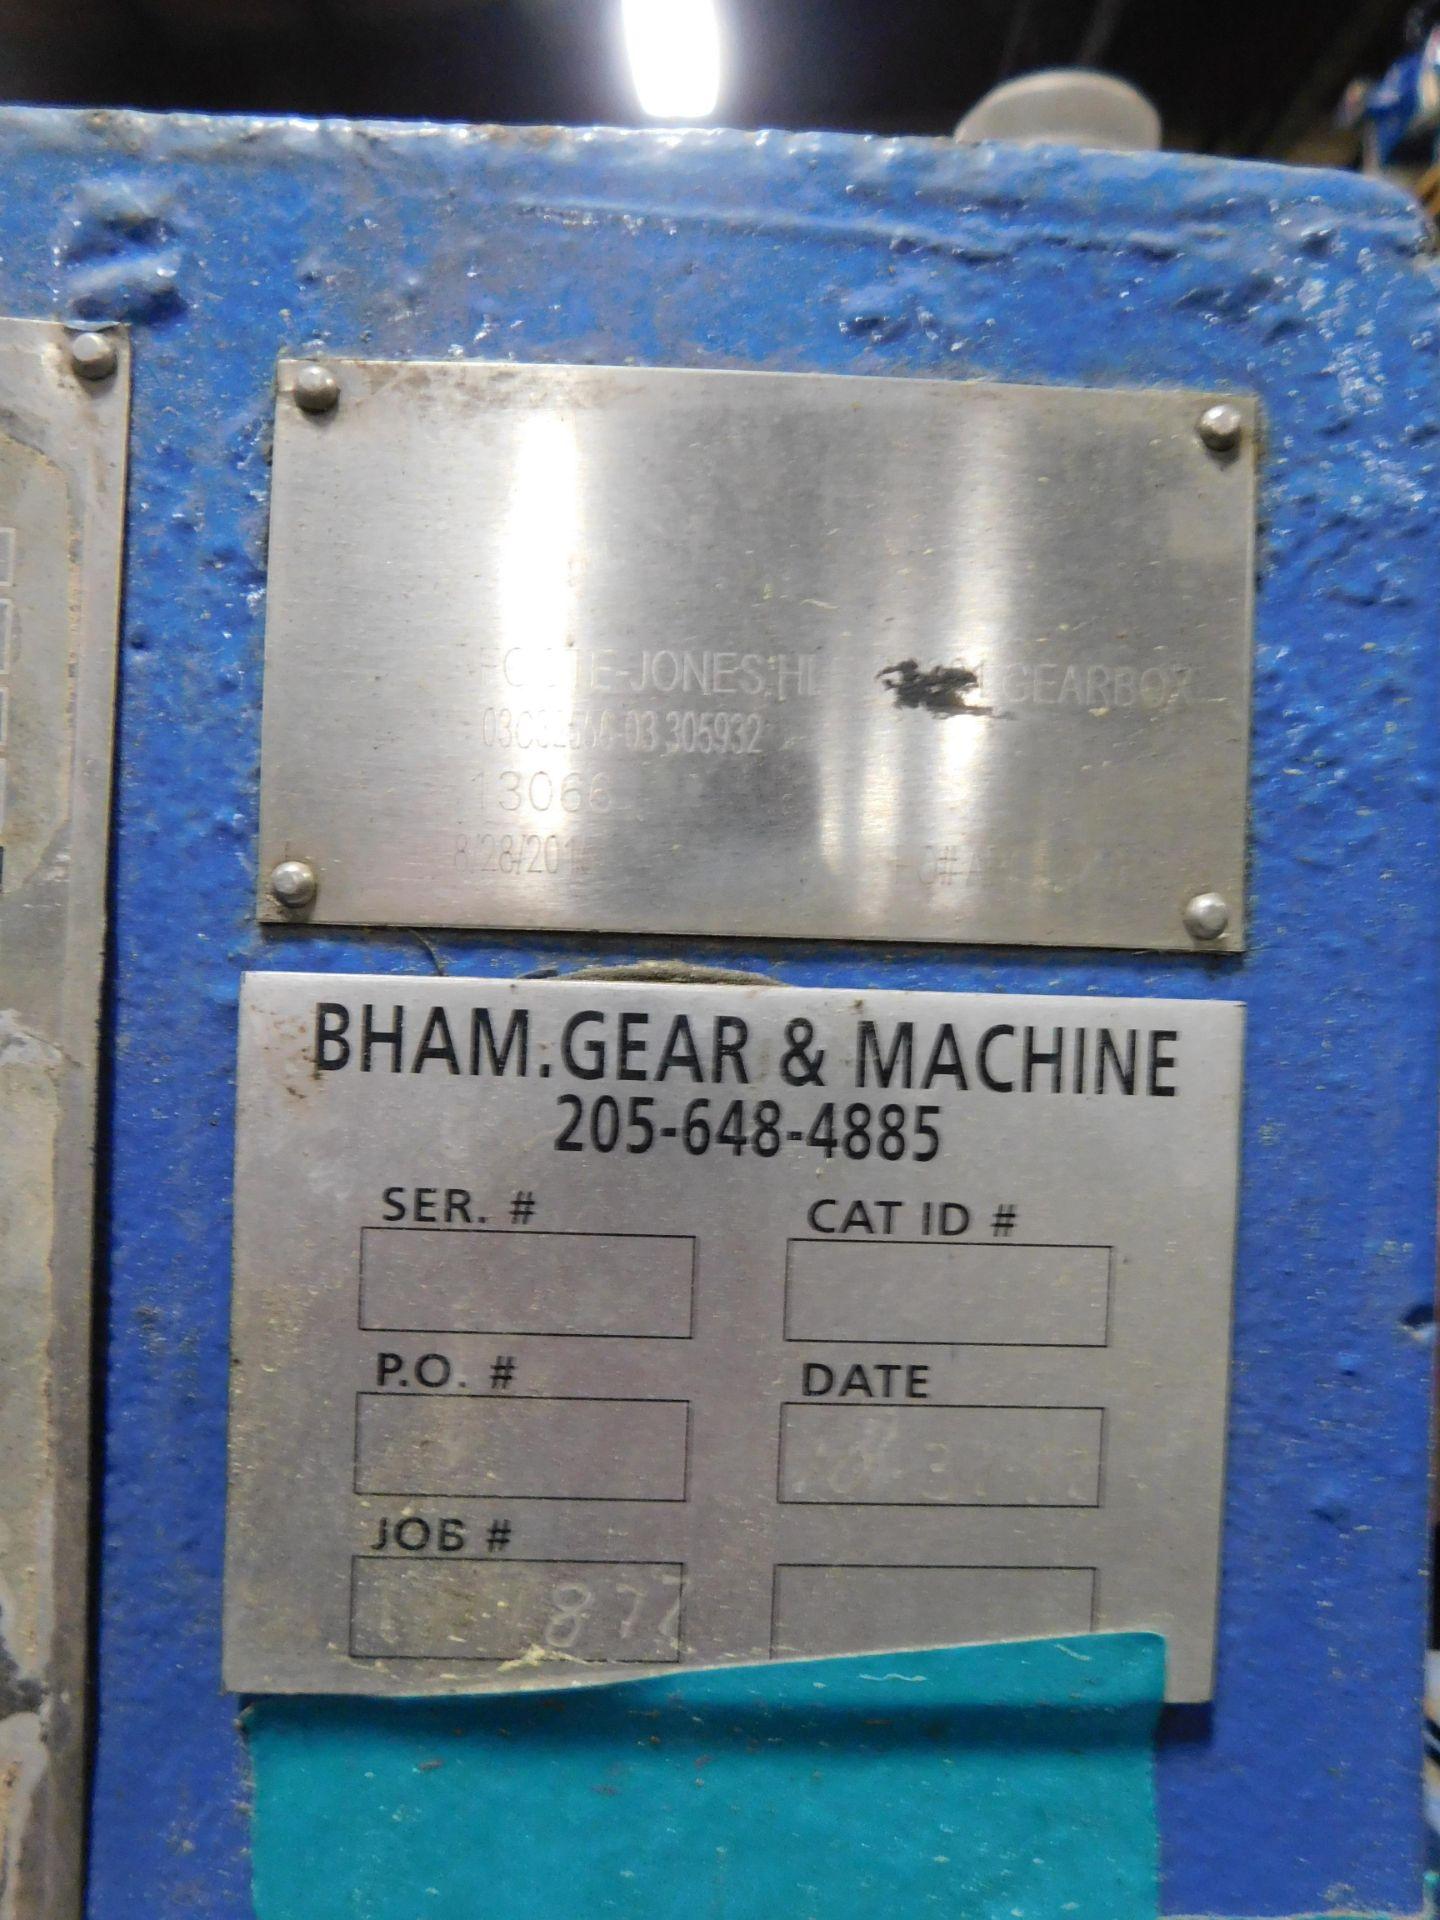 Reliance AC Duty Master Motor. 900 HP. 3 Ph. 60 Hz. 4160 V. 1789 RPM. 6809S. Type P. - Image 6 of 8